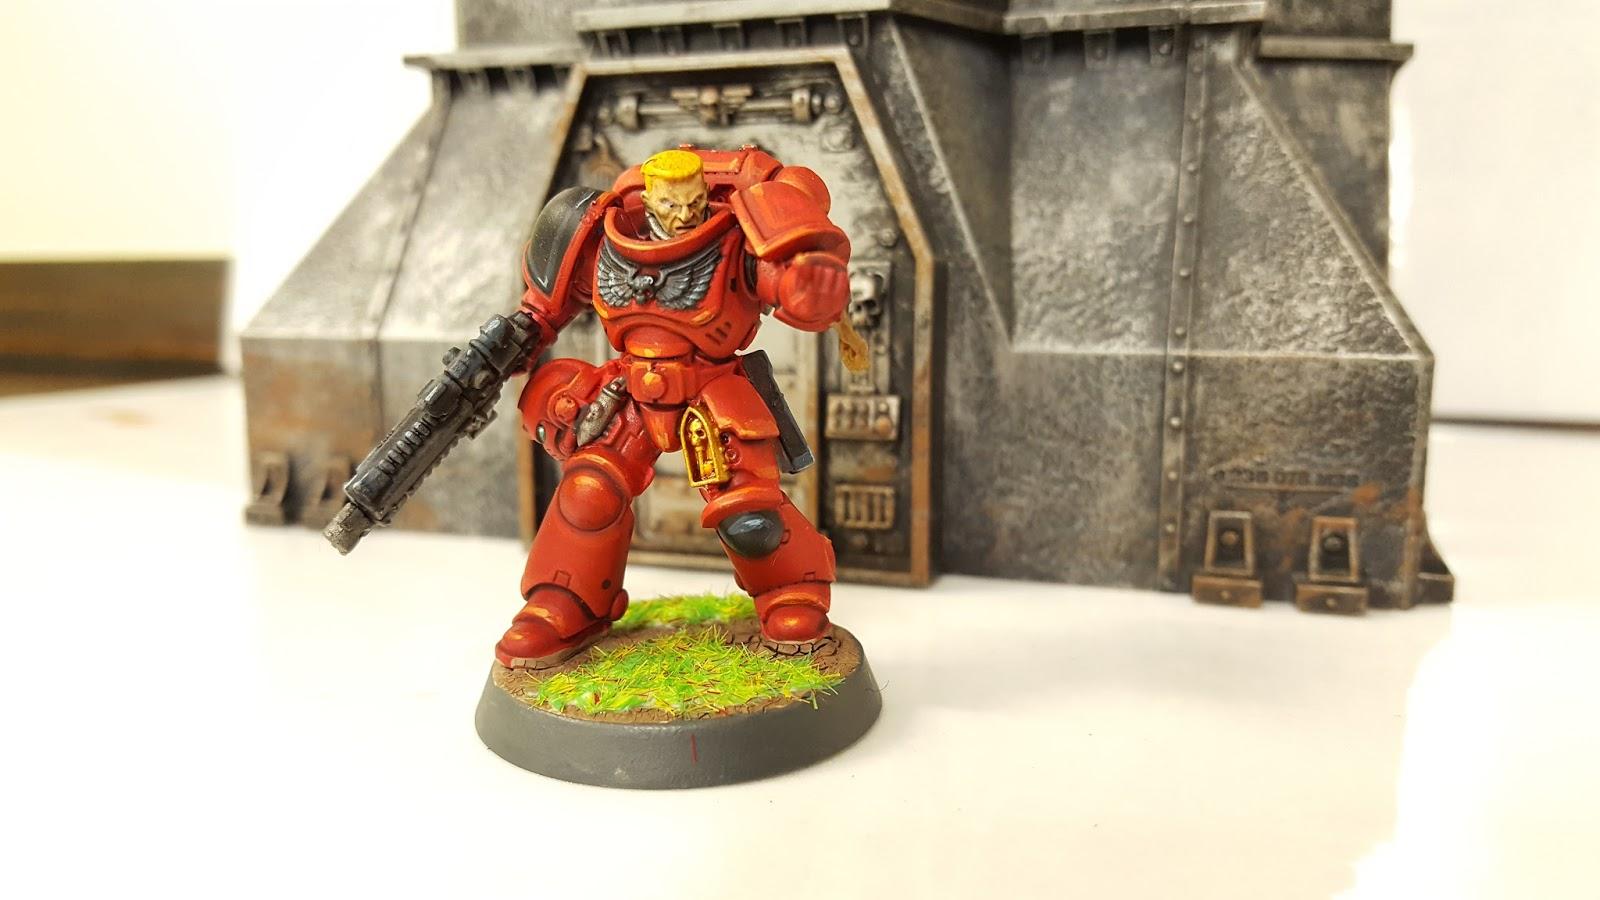 Warhammer 40k Blood Angels Intercessors M-1 pro-painted